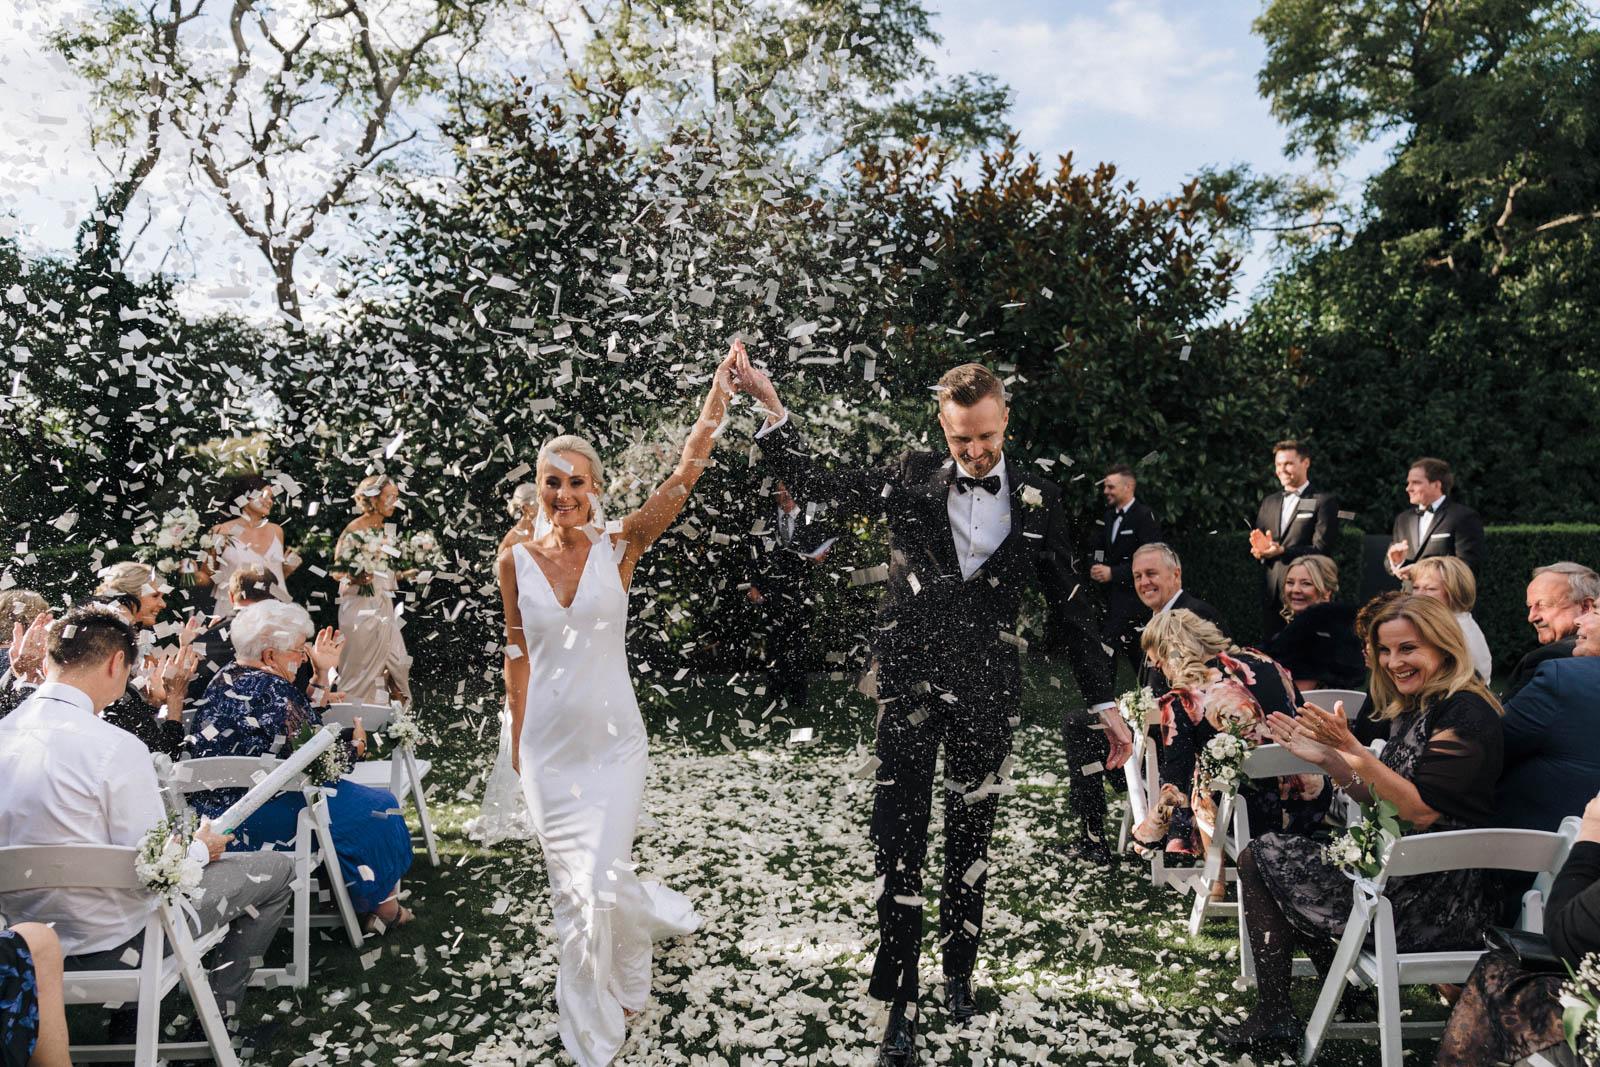 newfound-k-s-hilton-taupo-wedding-photographer-042